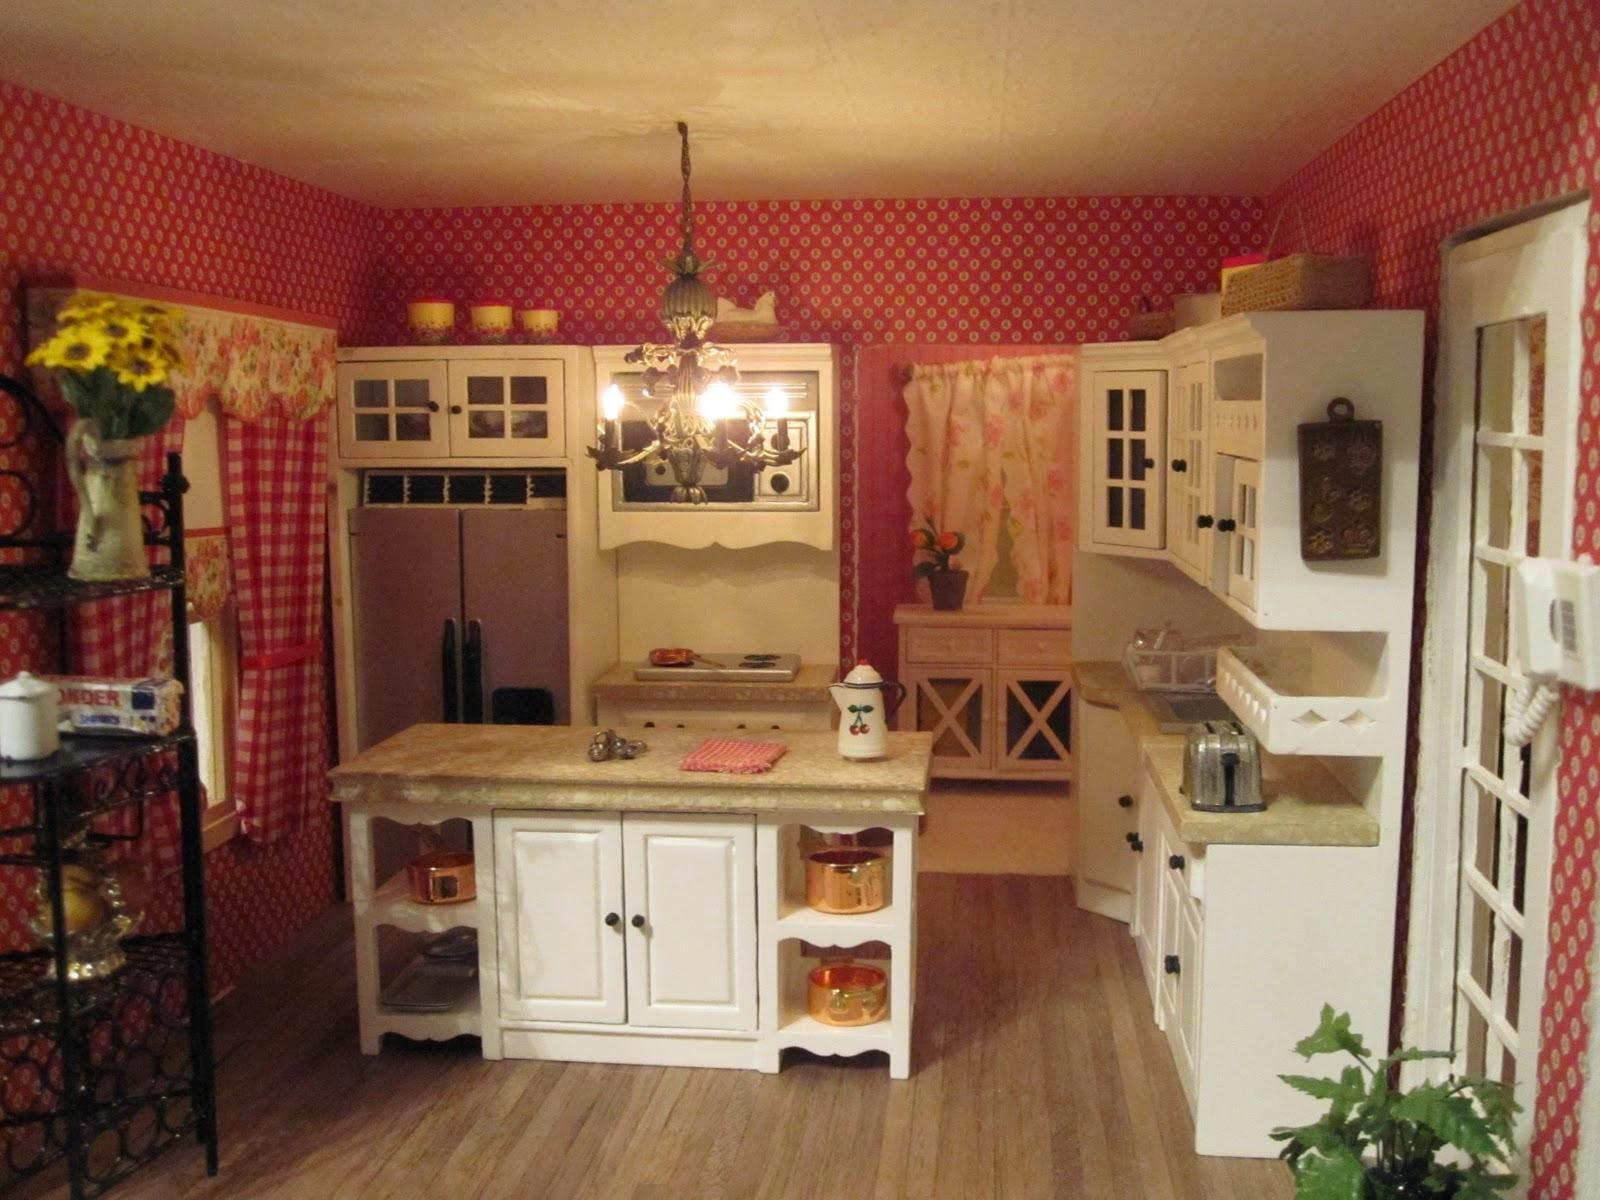 kitchen wallpaper patterns sink drain installation country 7 designs enhancedhomes org